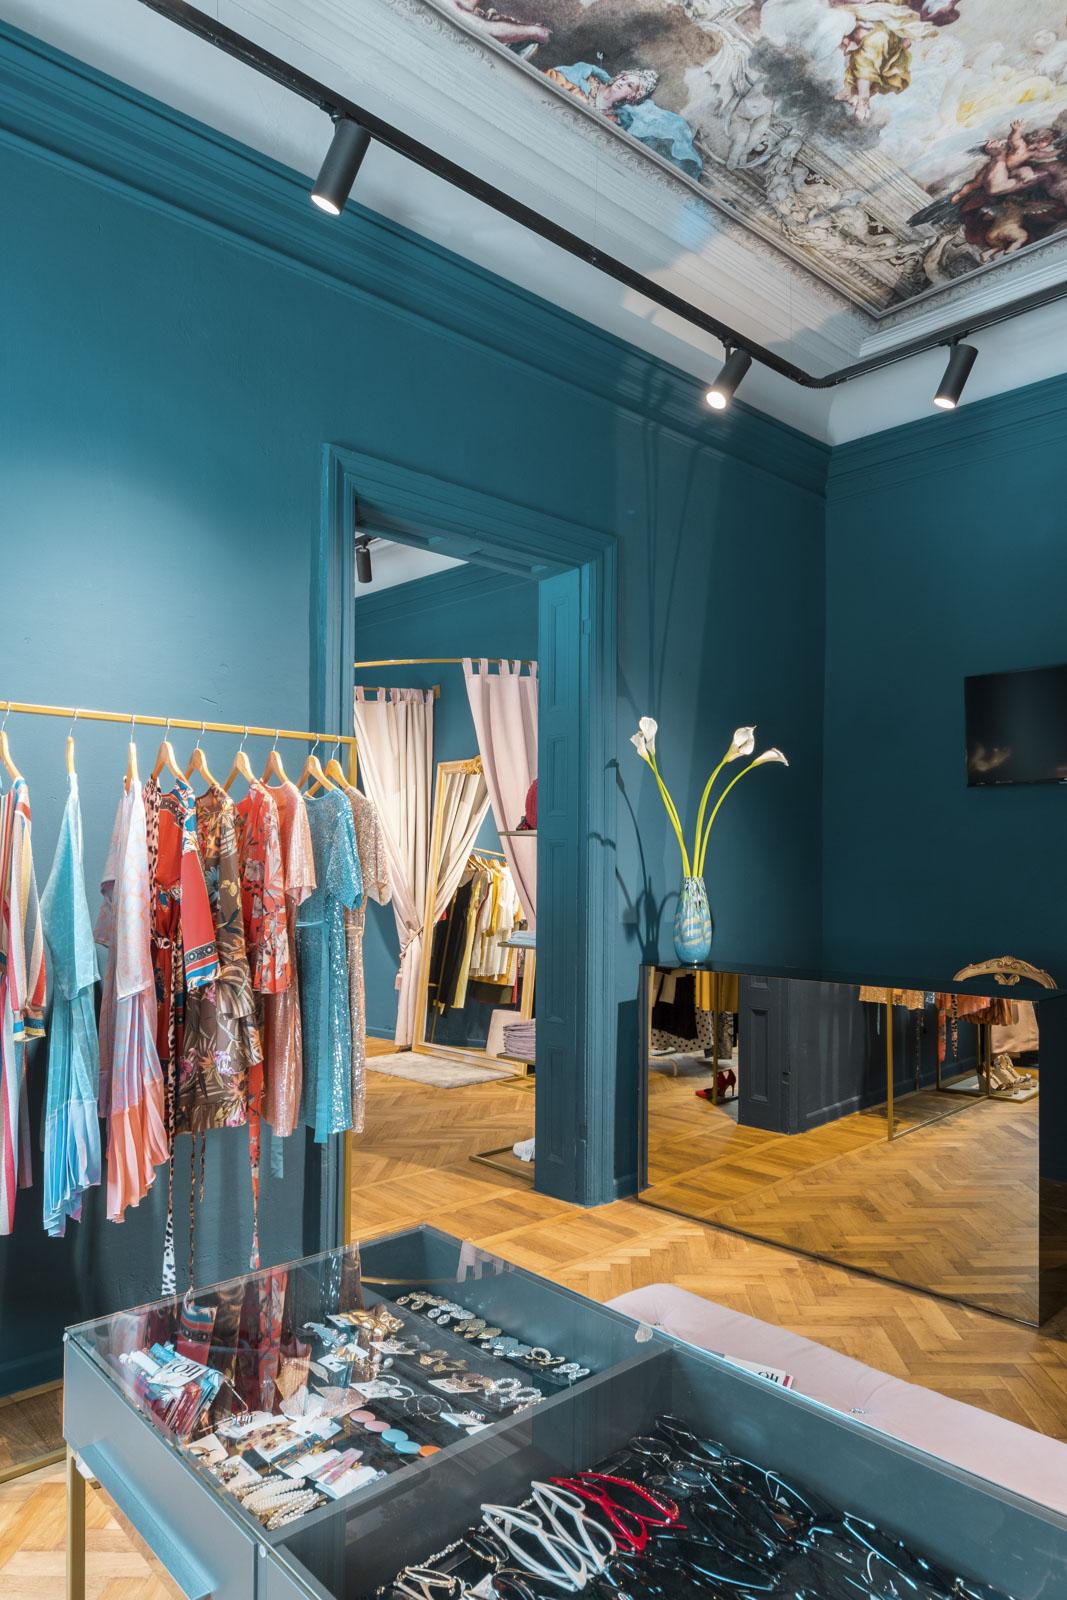 design interior magazin de haine pentru femei Moldova Chisinau